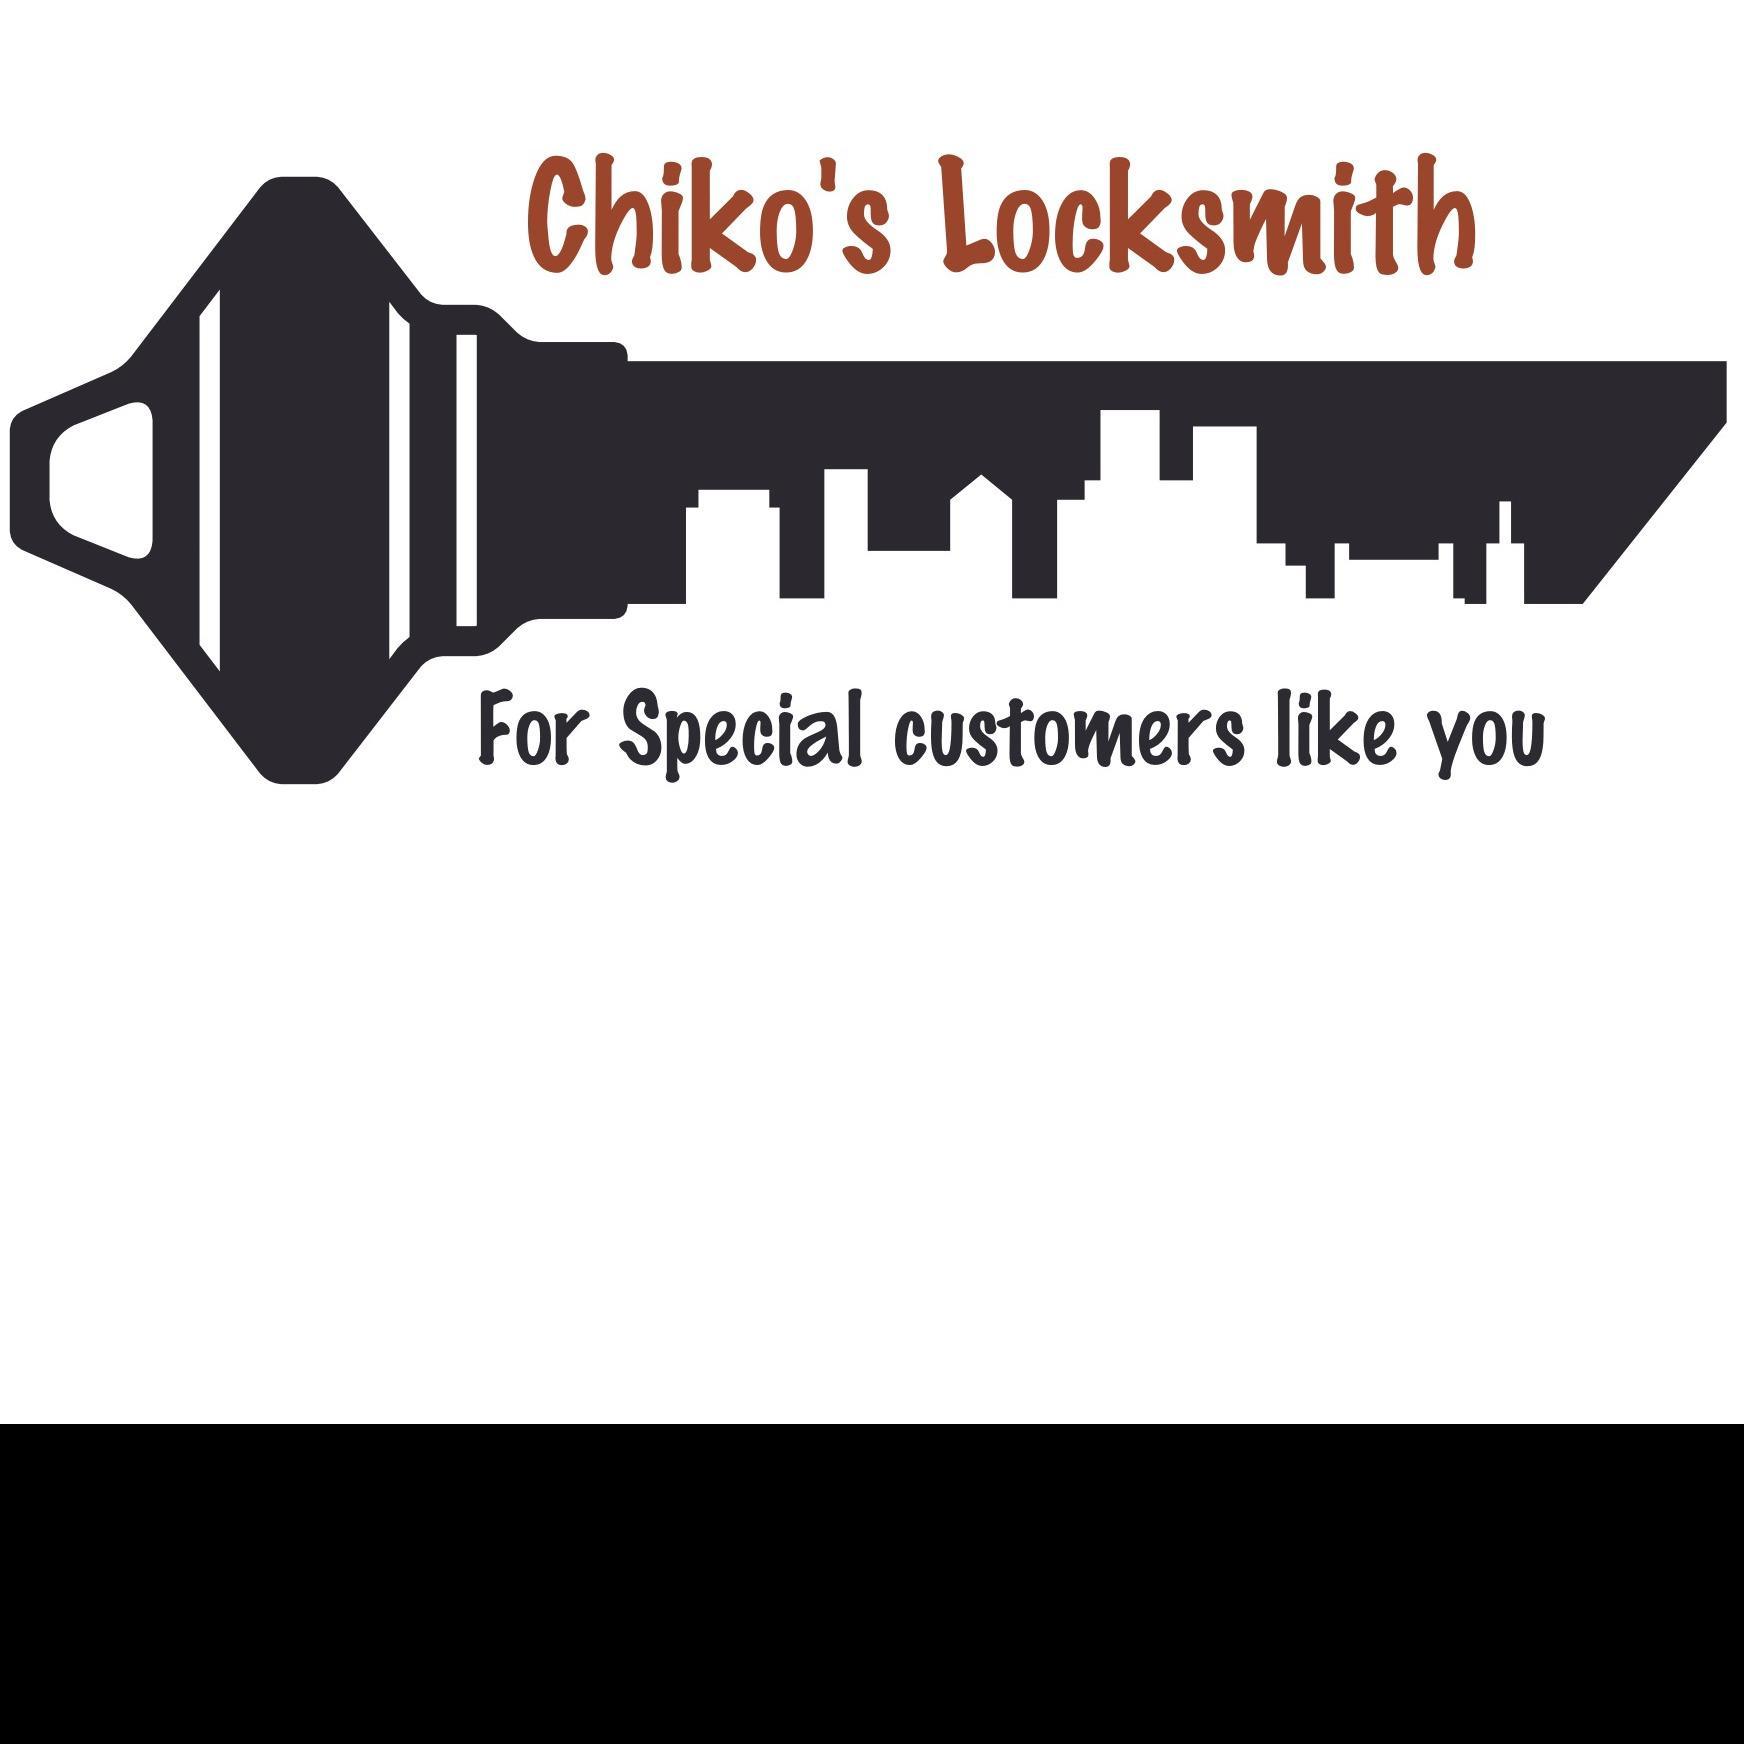 Chiko's Locksmith